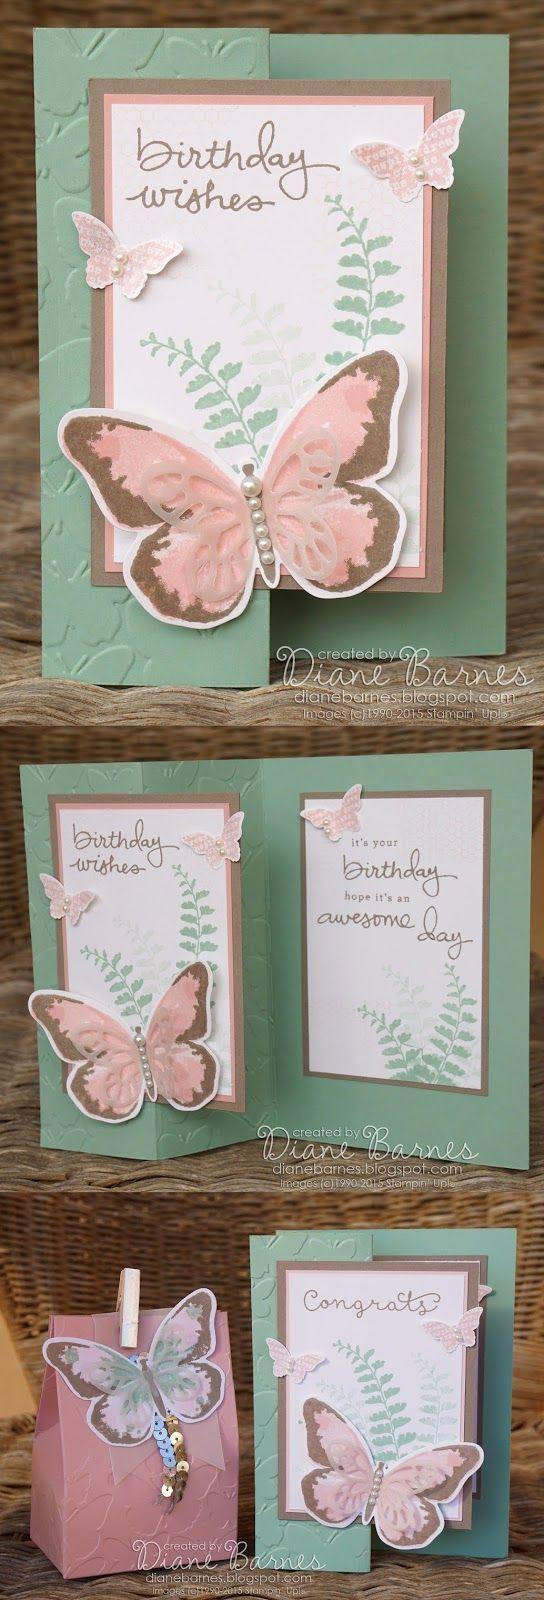 603 Best Birthday Cards 2 Images On Pinterest Birthdays Handmade